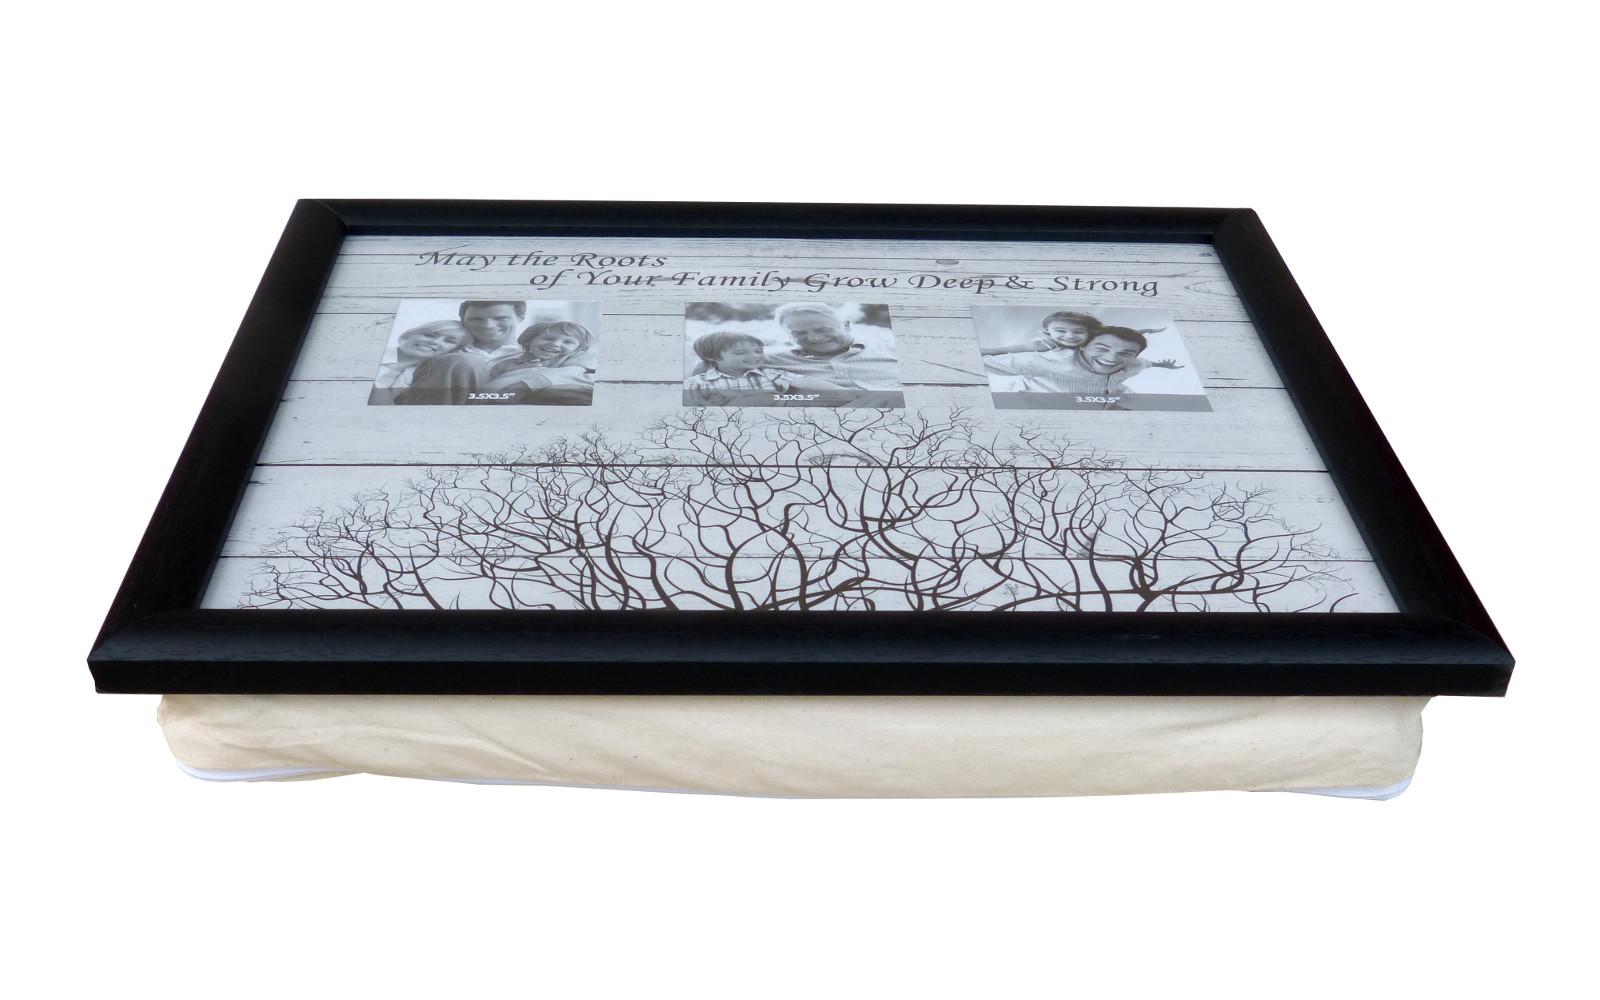 knietablett betttablett bilderrahmen kissen tablet laptop notebook fr hst ck ebay. Black Bedroom Furniture Sets. Home Design Ideas